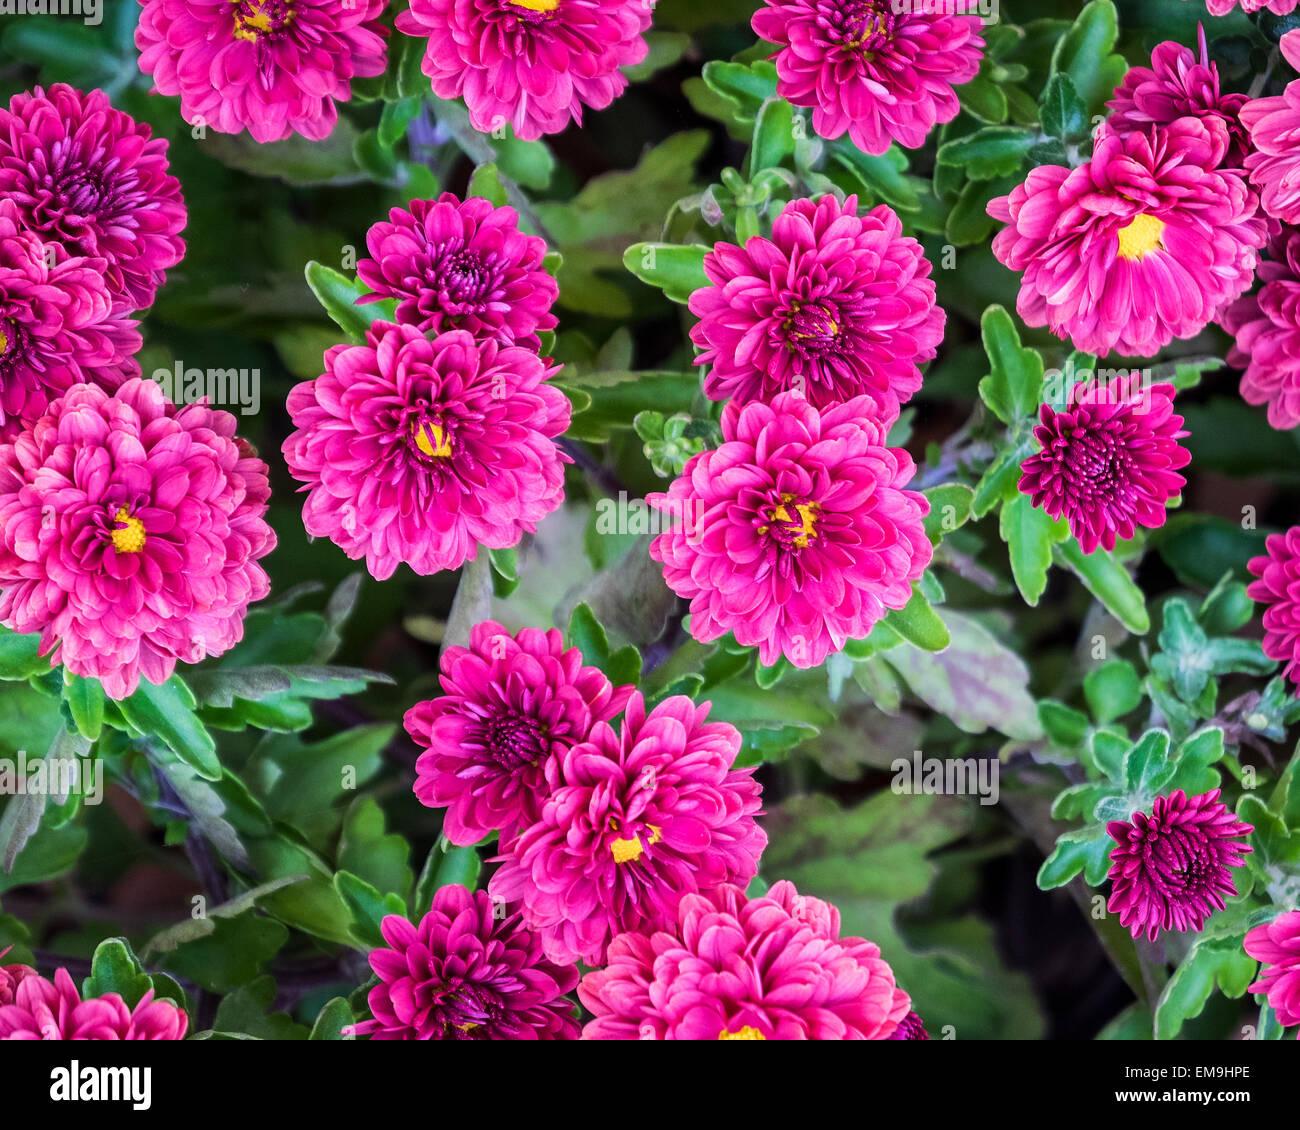 Purple Chrysanthemums, Asteraceae, blooming in an autumn garden. Oklahoma, USA. - Stock Image